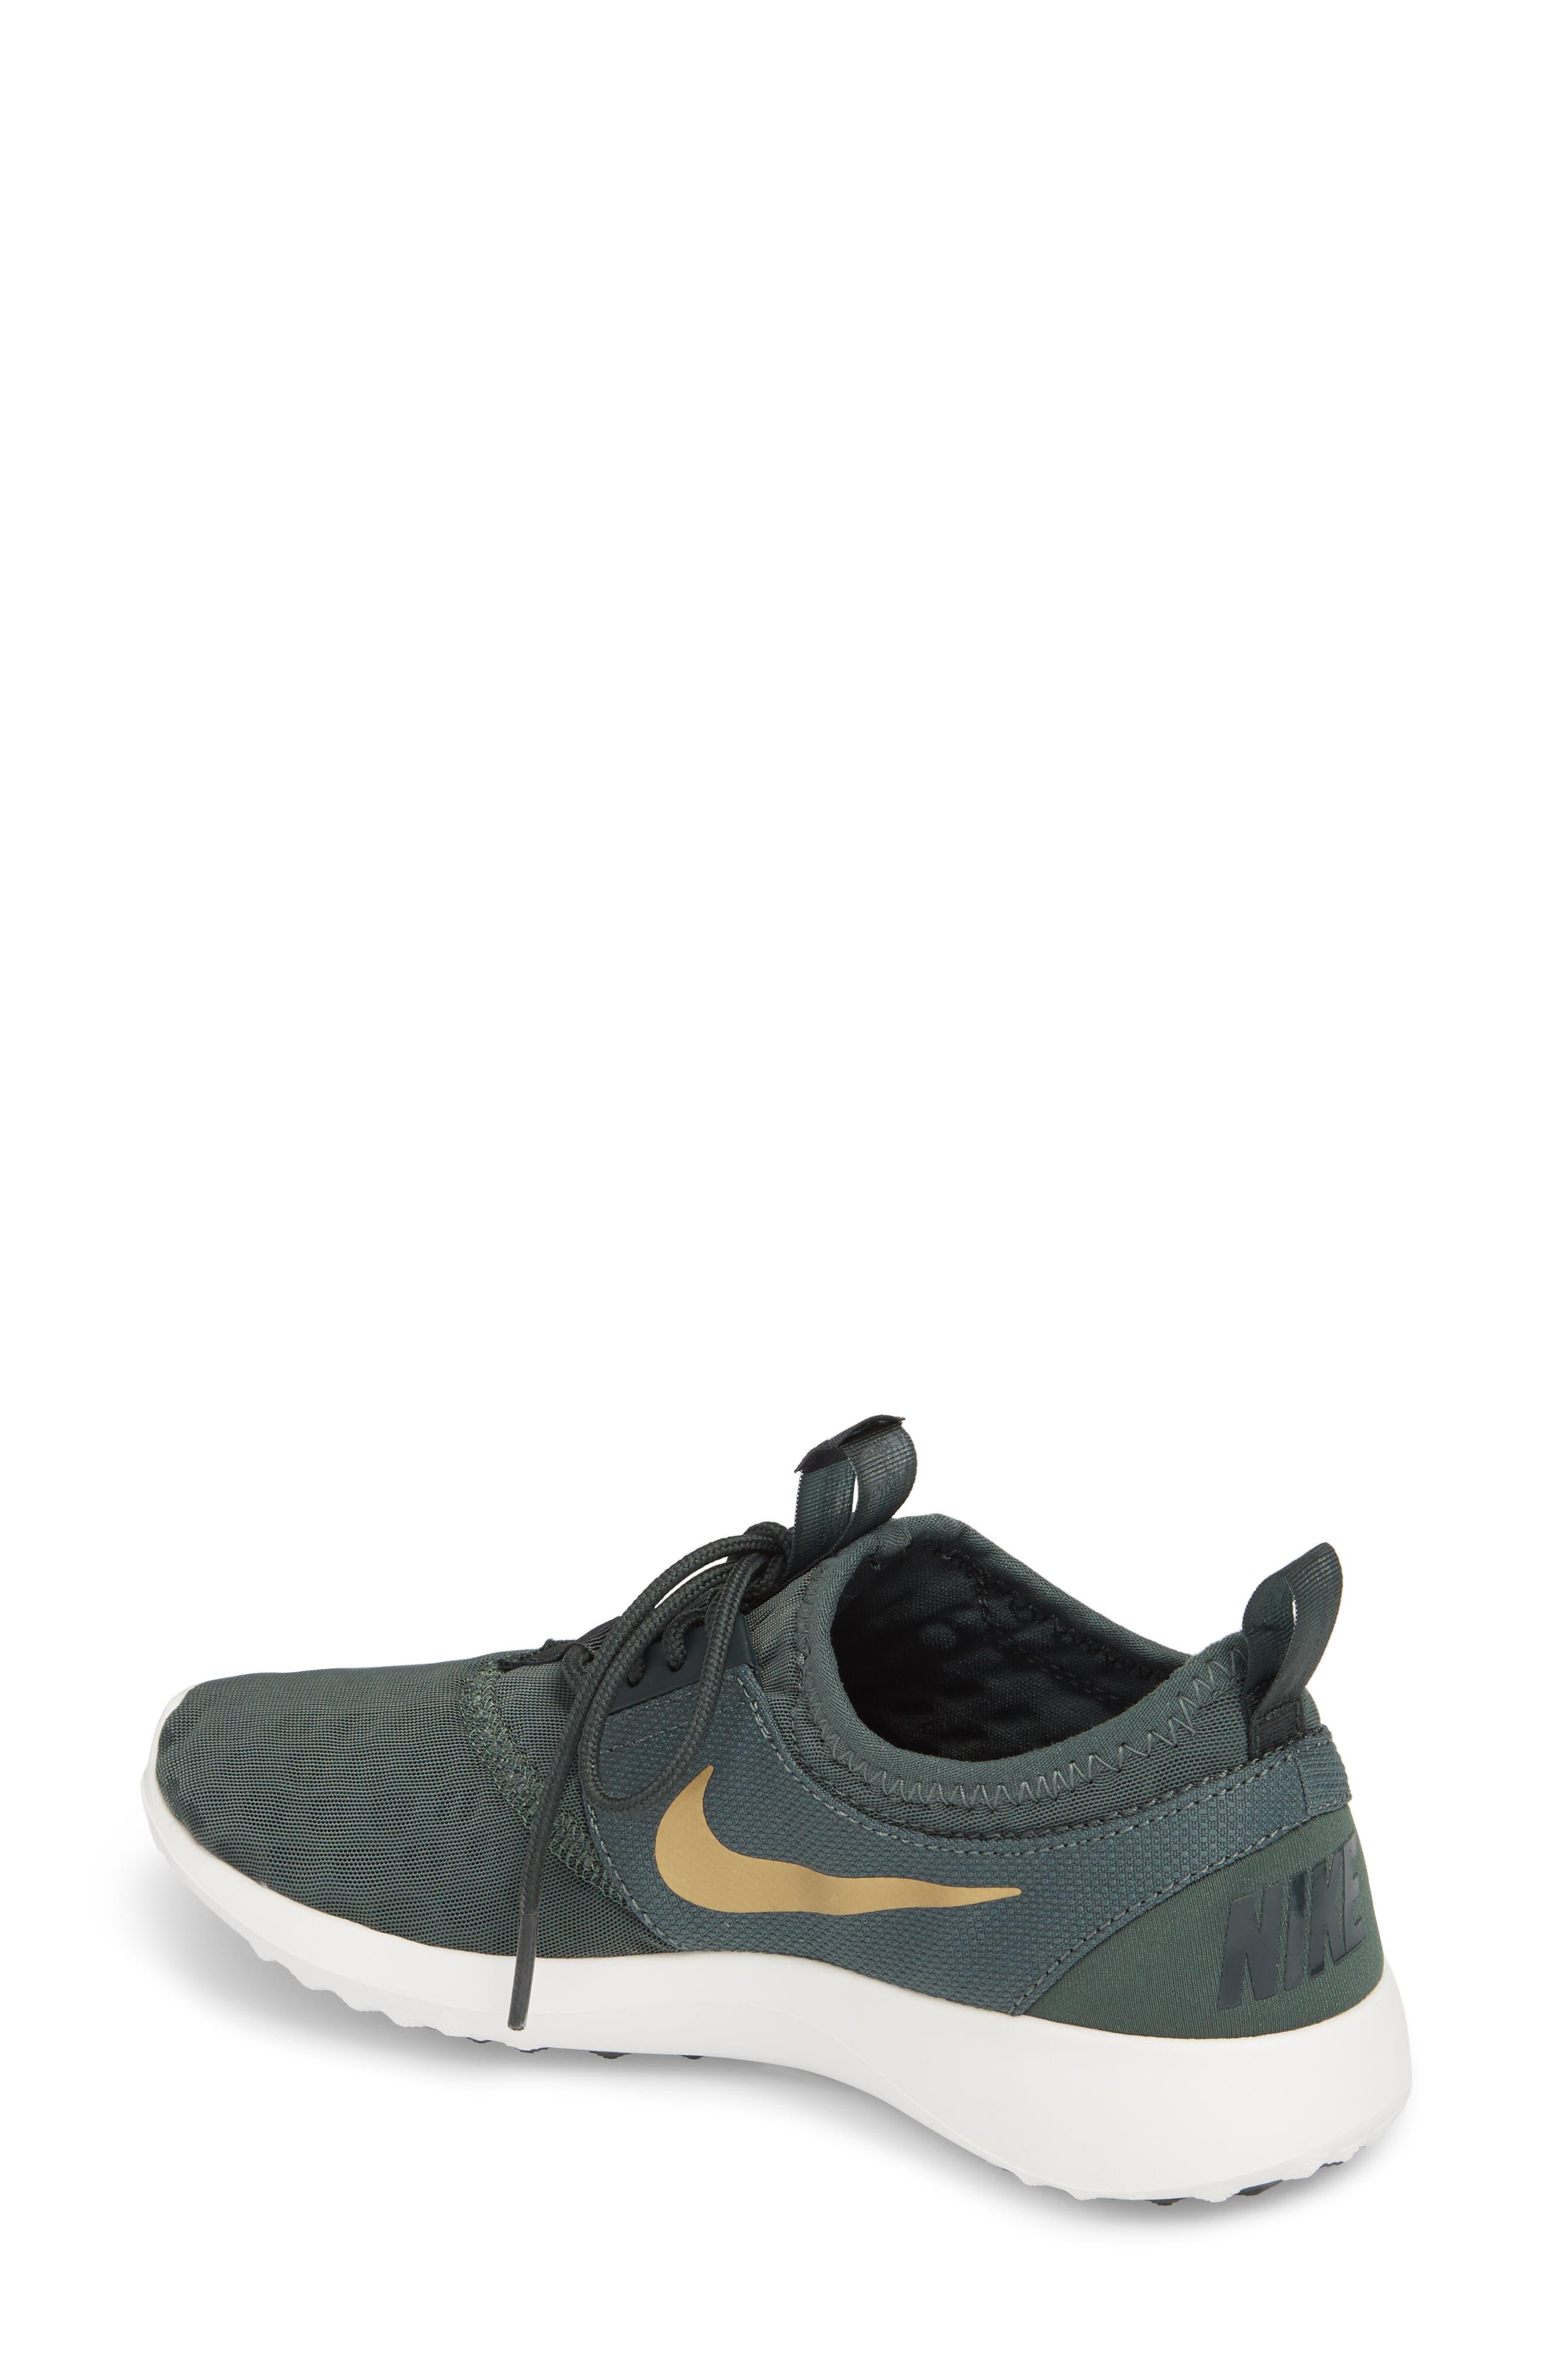 ,                             'Juvenate' Sneaker,                             Alternate thumbnail 183, color,                             310